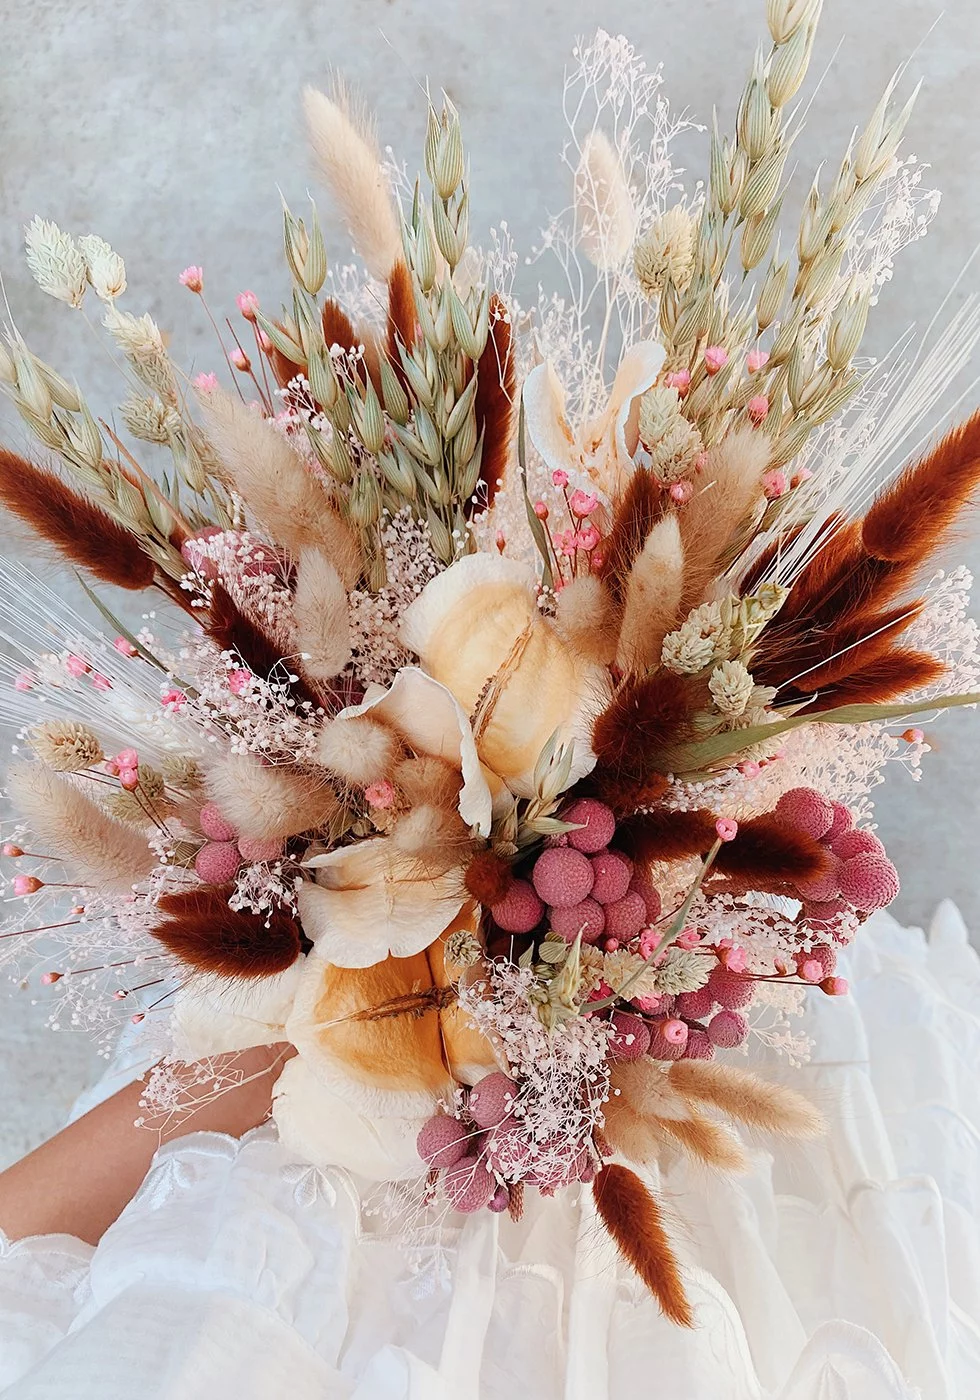 DIY Dried Flower Bouquet – Honestly WTF